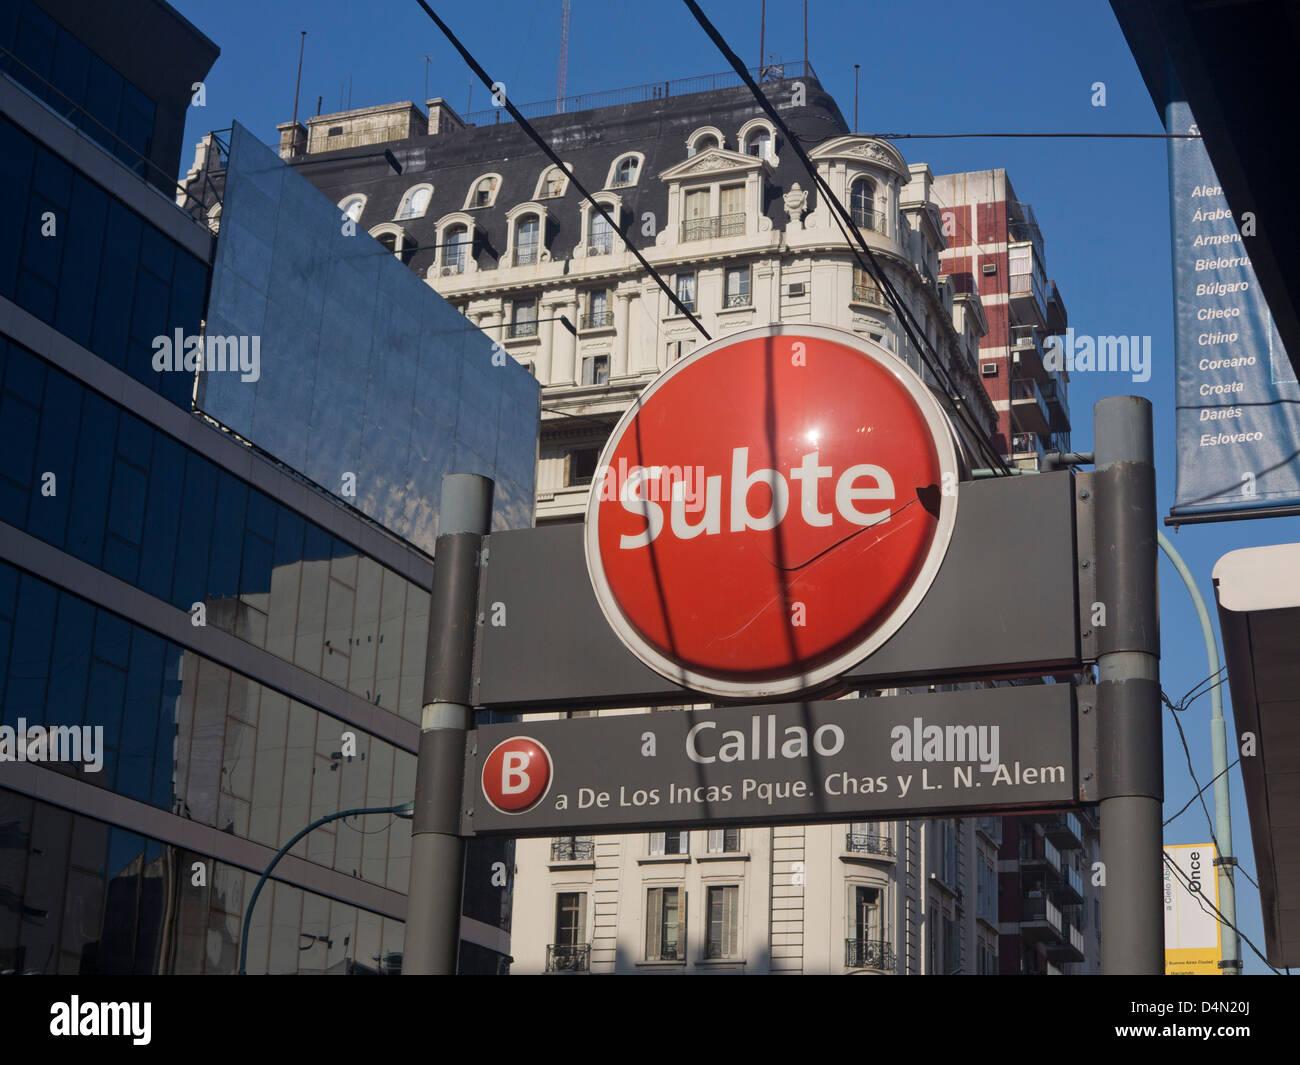 Calla 'subte' underground station in Buenos Aires, Argentina - Stock Image